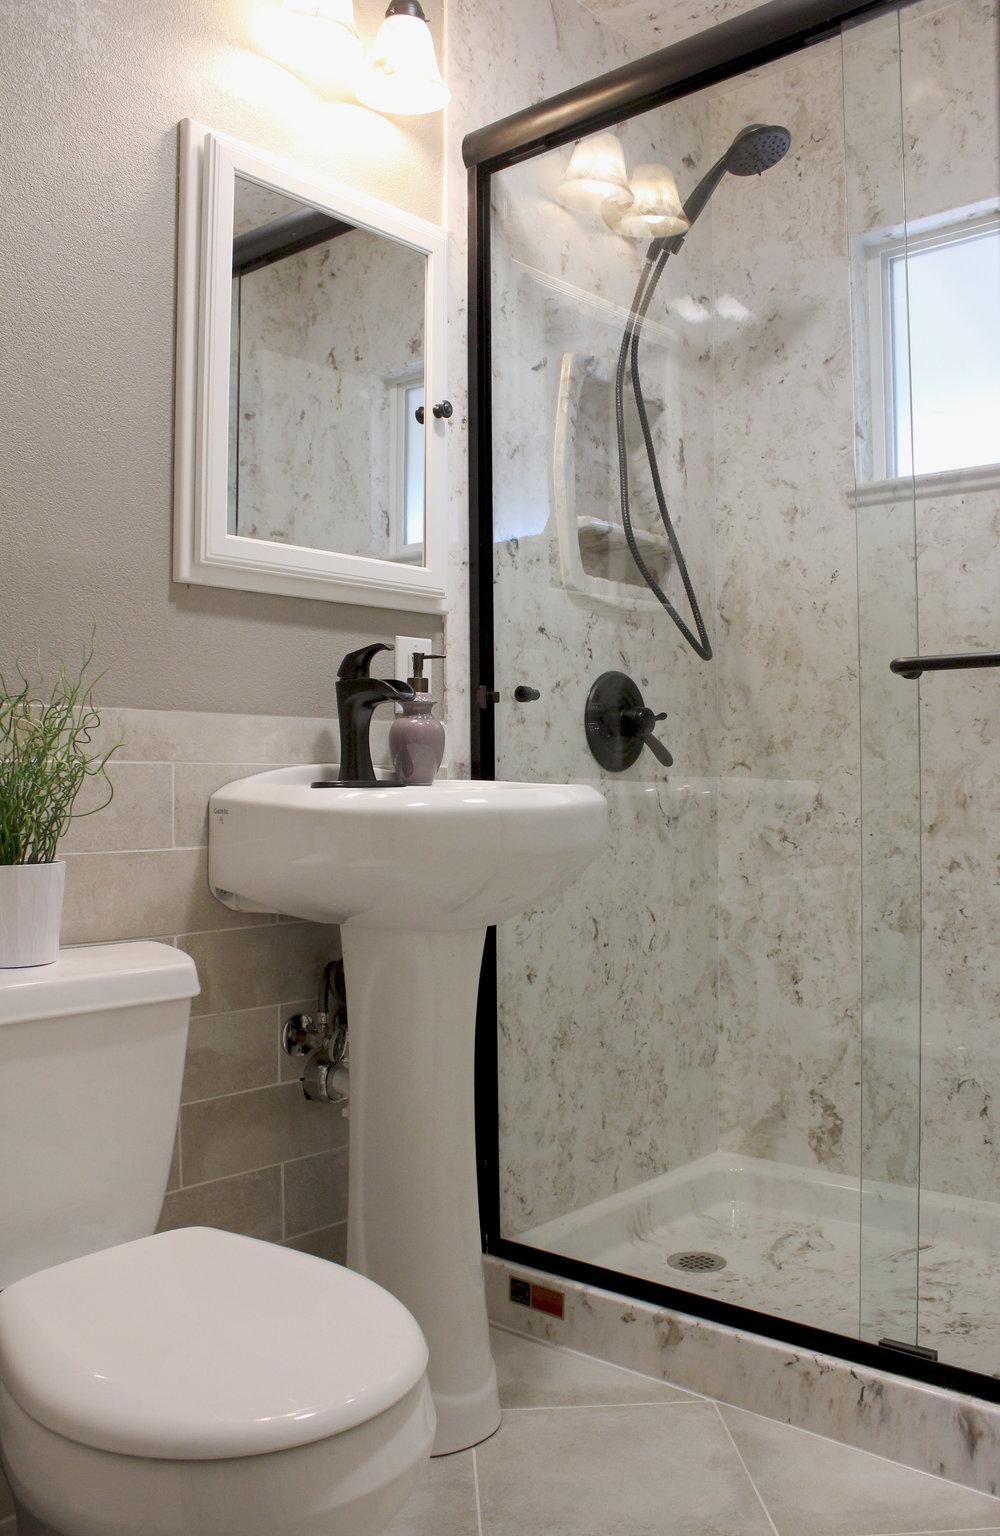 Bonito-Full bath-from door 33.jpg